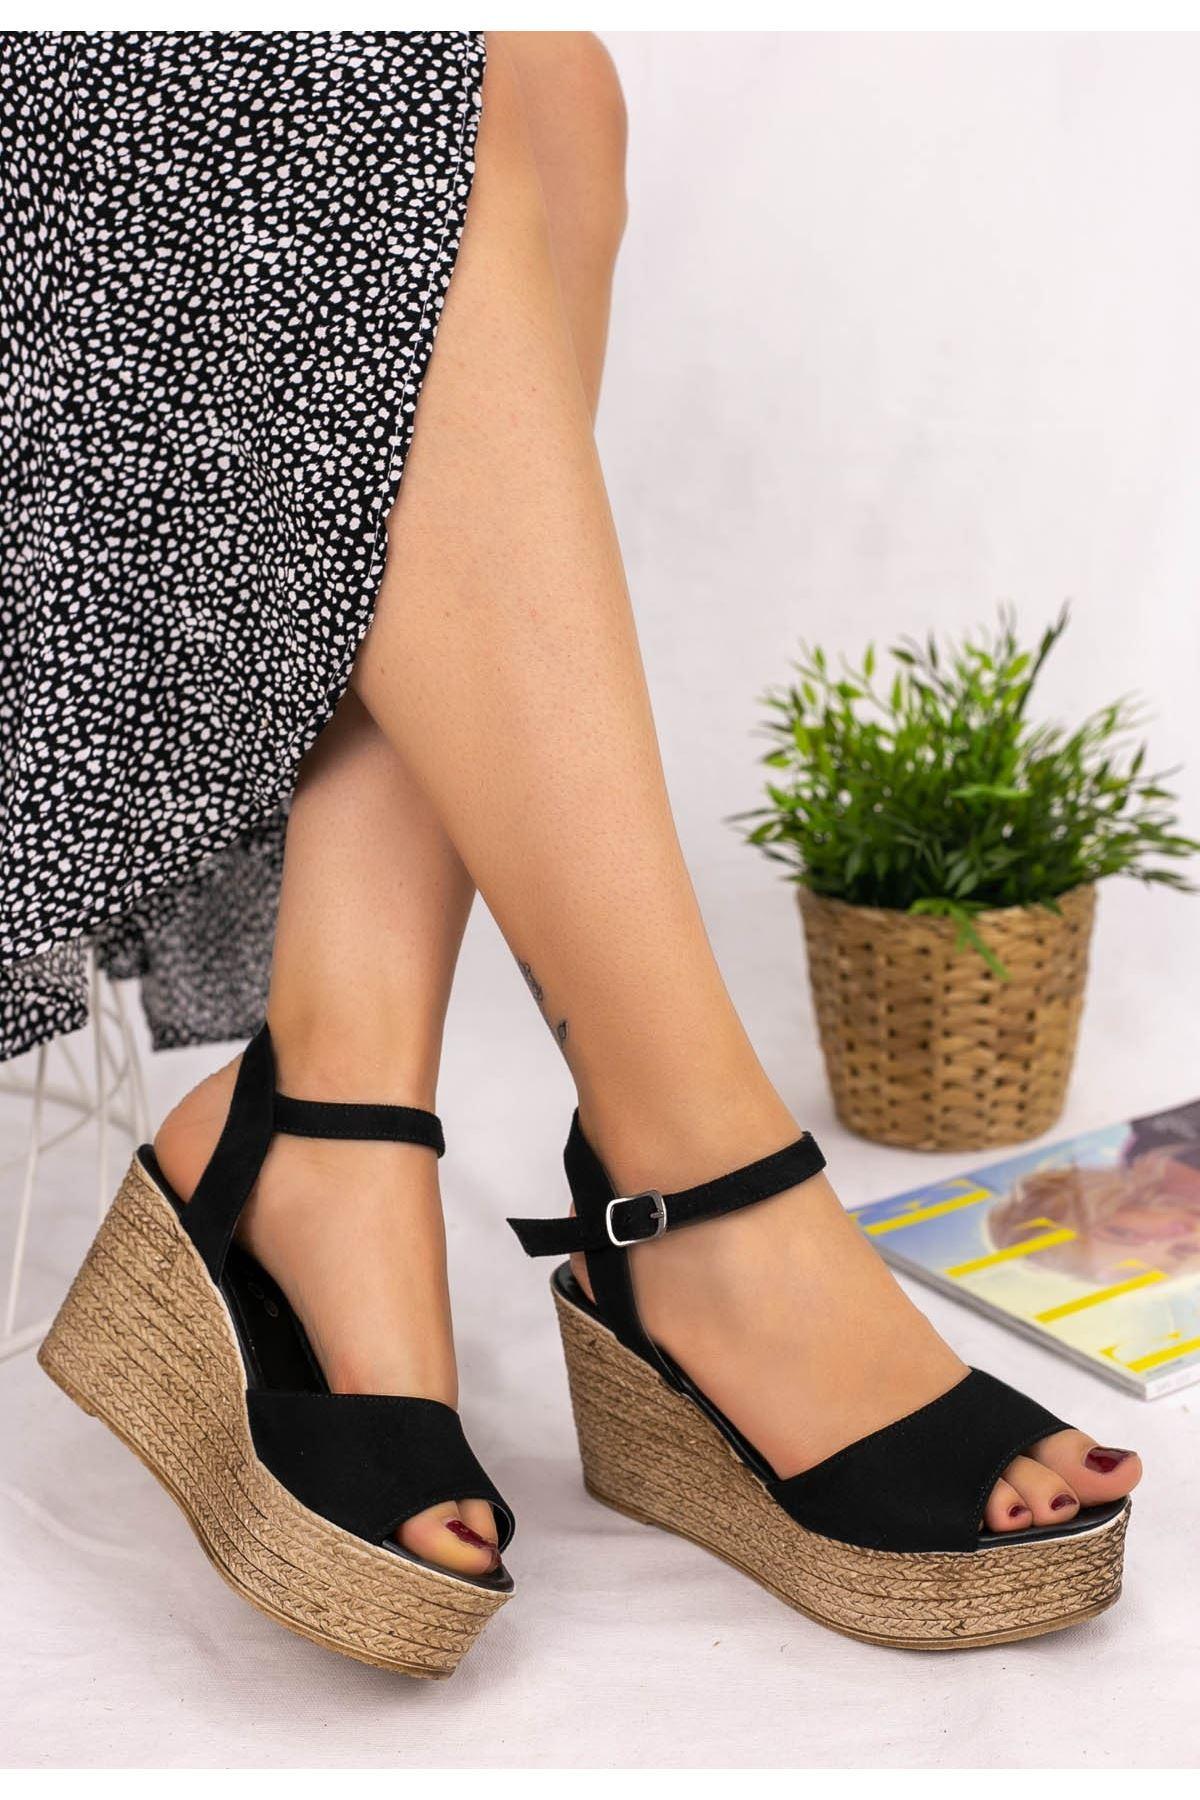 Olivie Siyah Süet Dolgu Topuk Sandalet